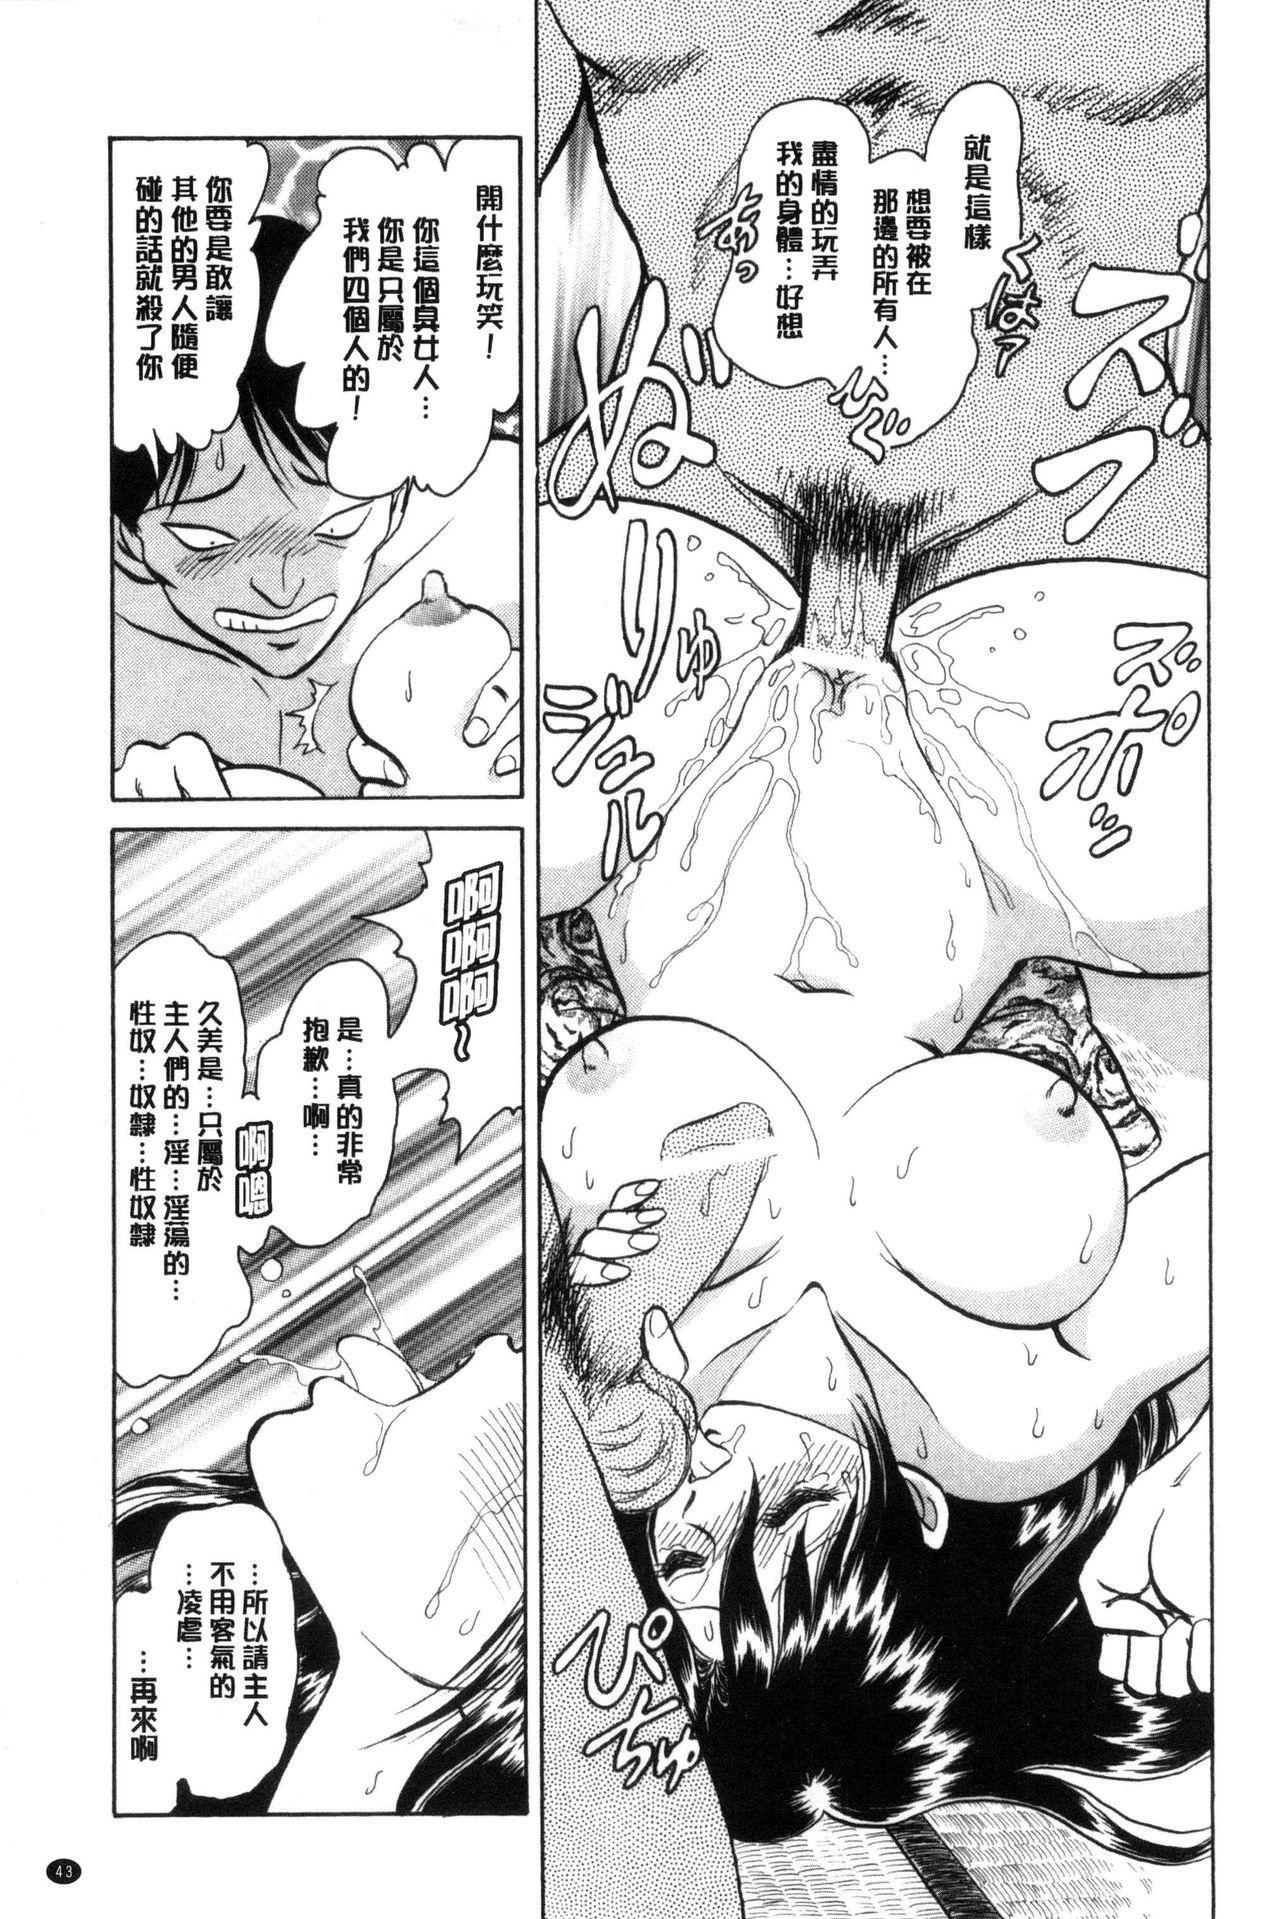 Hazukashii Kagai Jugyou | 害羞的課外授業 43